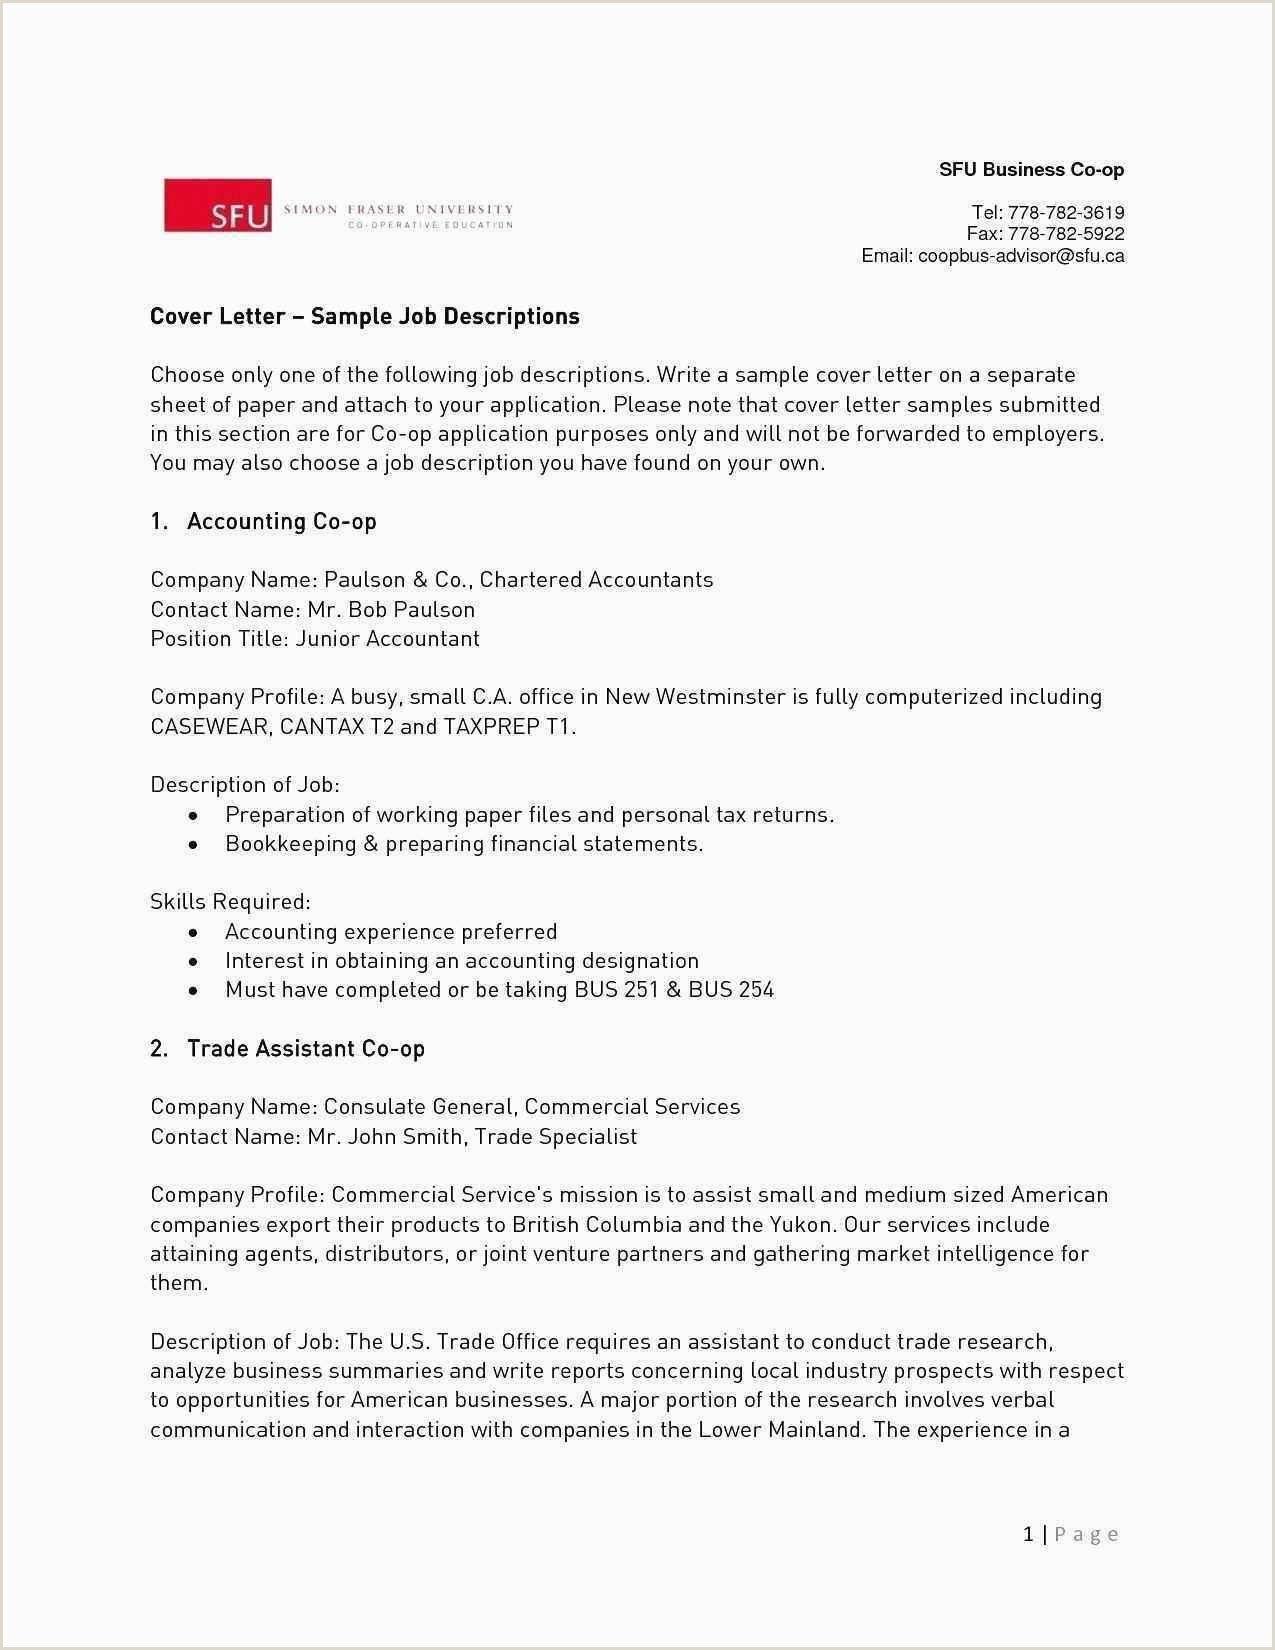 Career Objective for Finance Career Objective for Finance